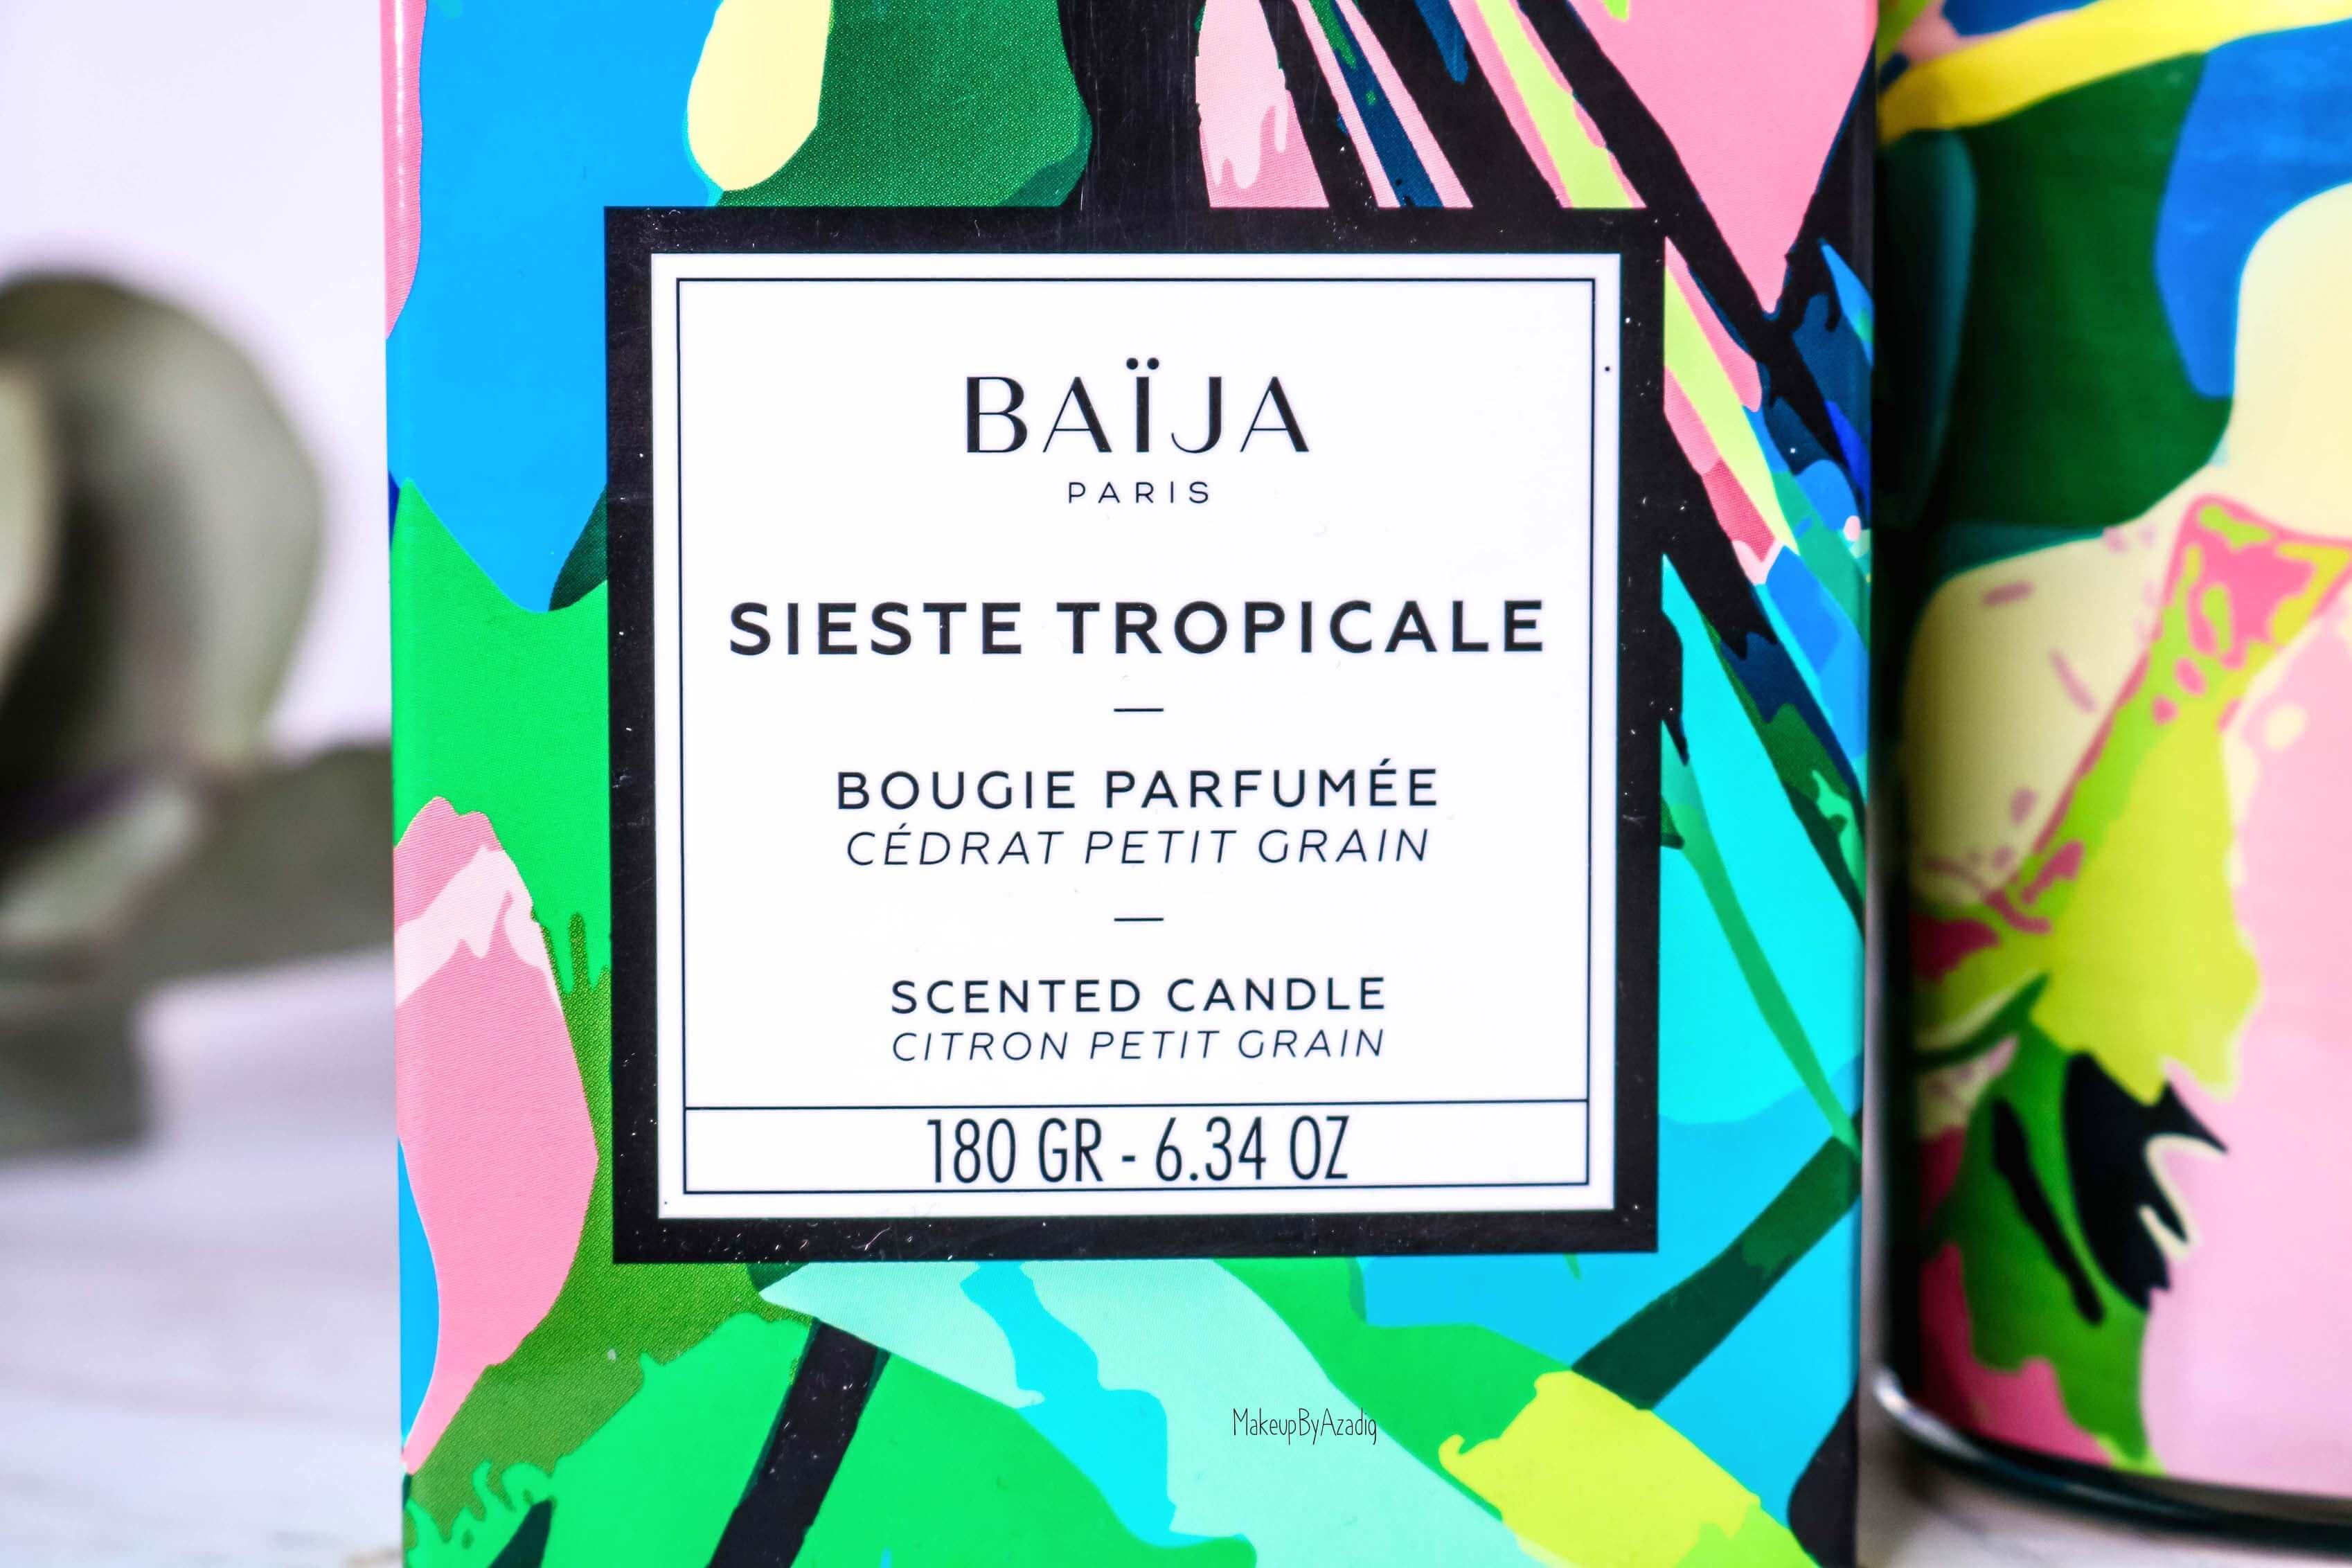 revue-collection-sieste-tropicale-baija--cedrat-paris-corps-bougie-gommage-soin-citron-makeupbyazadig-avis-prix-sephora-grain